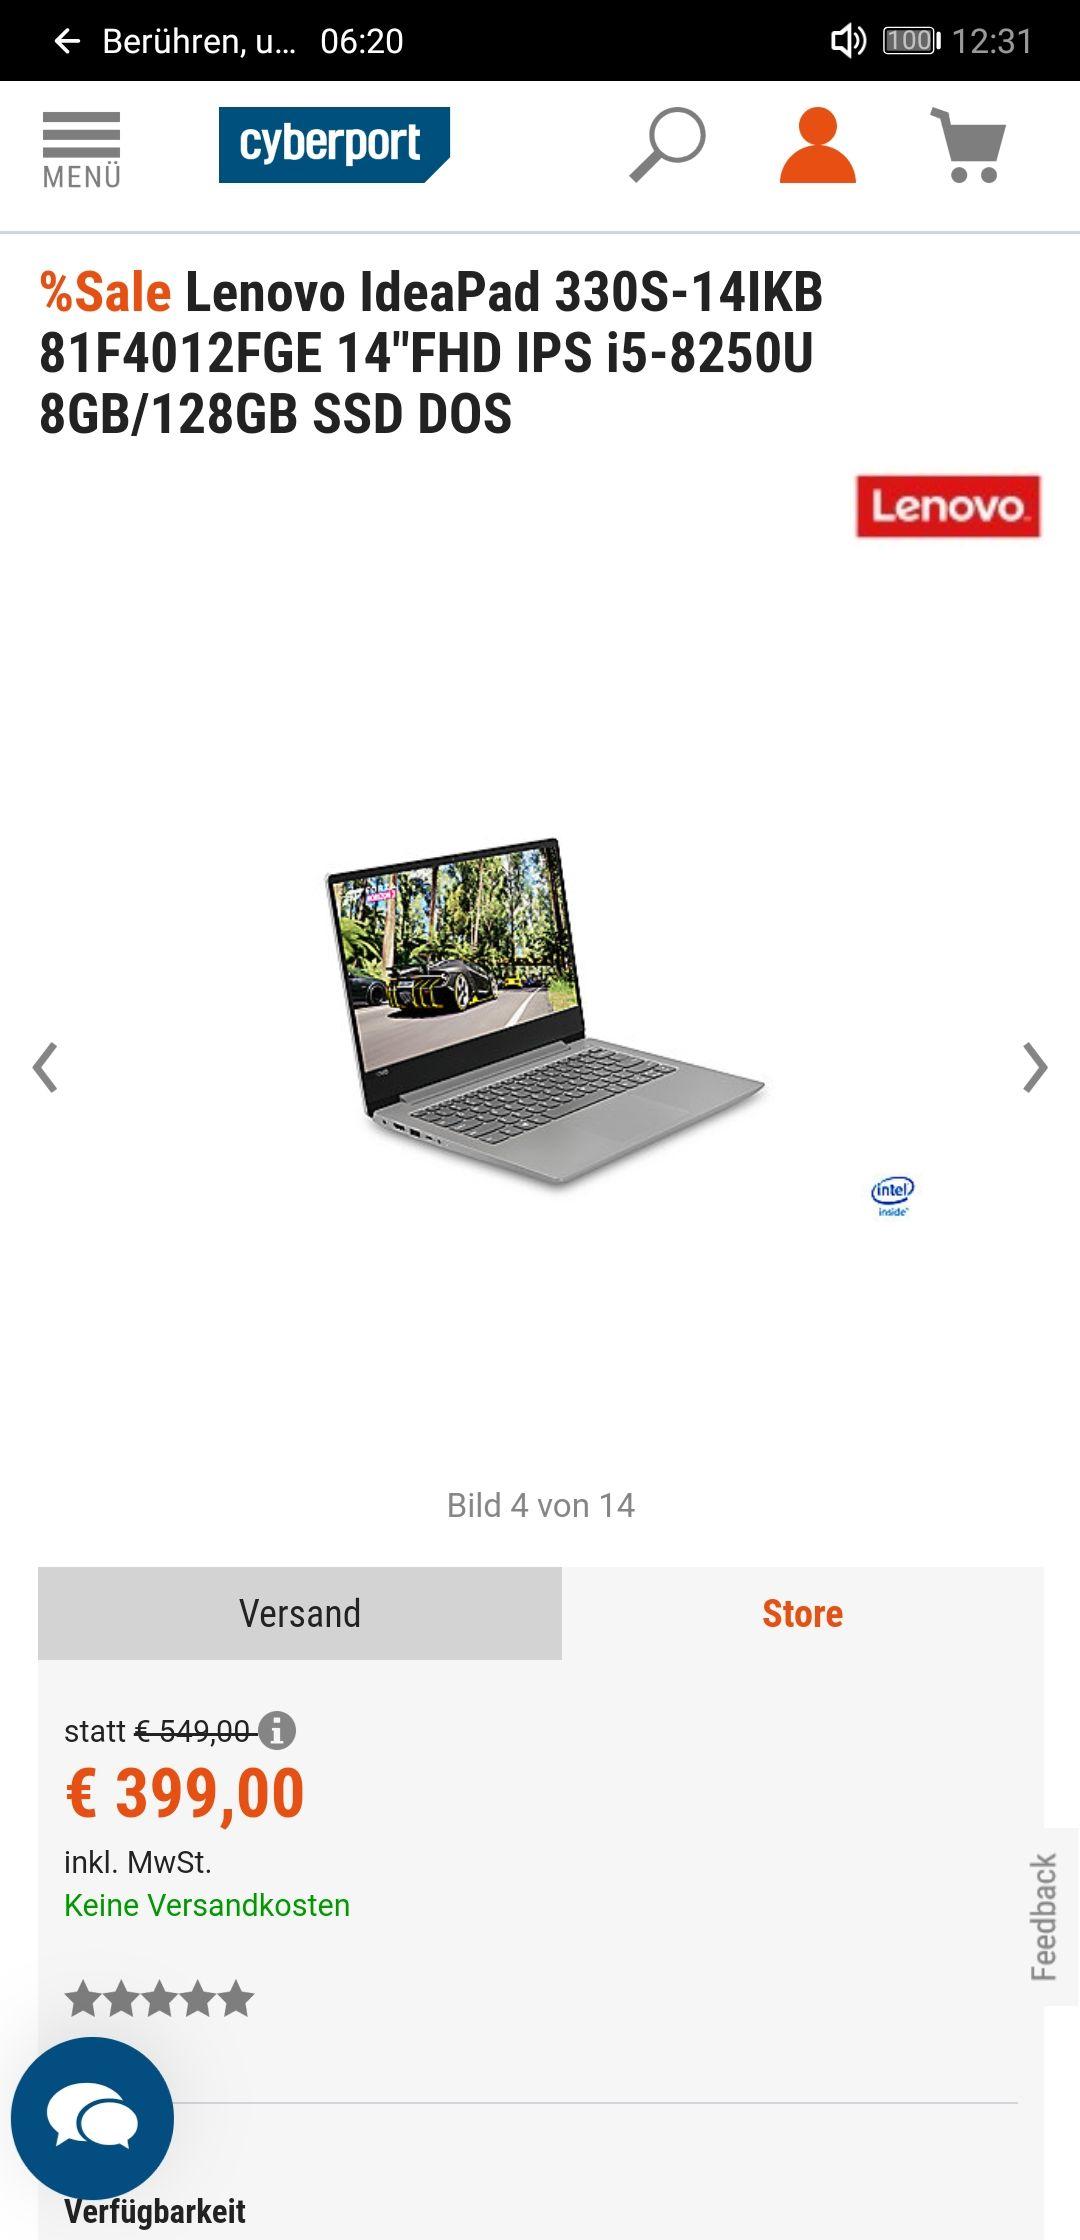 Lenovo Ideapad 330s - i5 8250u, 8GB RAM, 128GB SSD, 14 Zoll